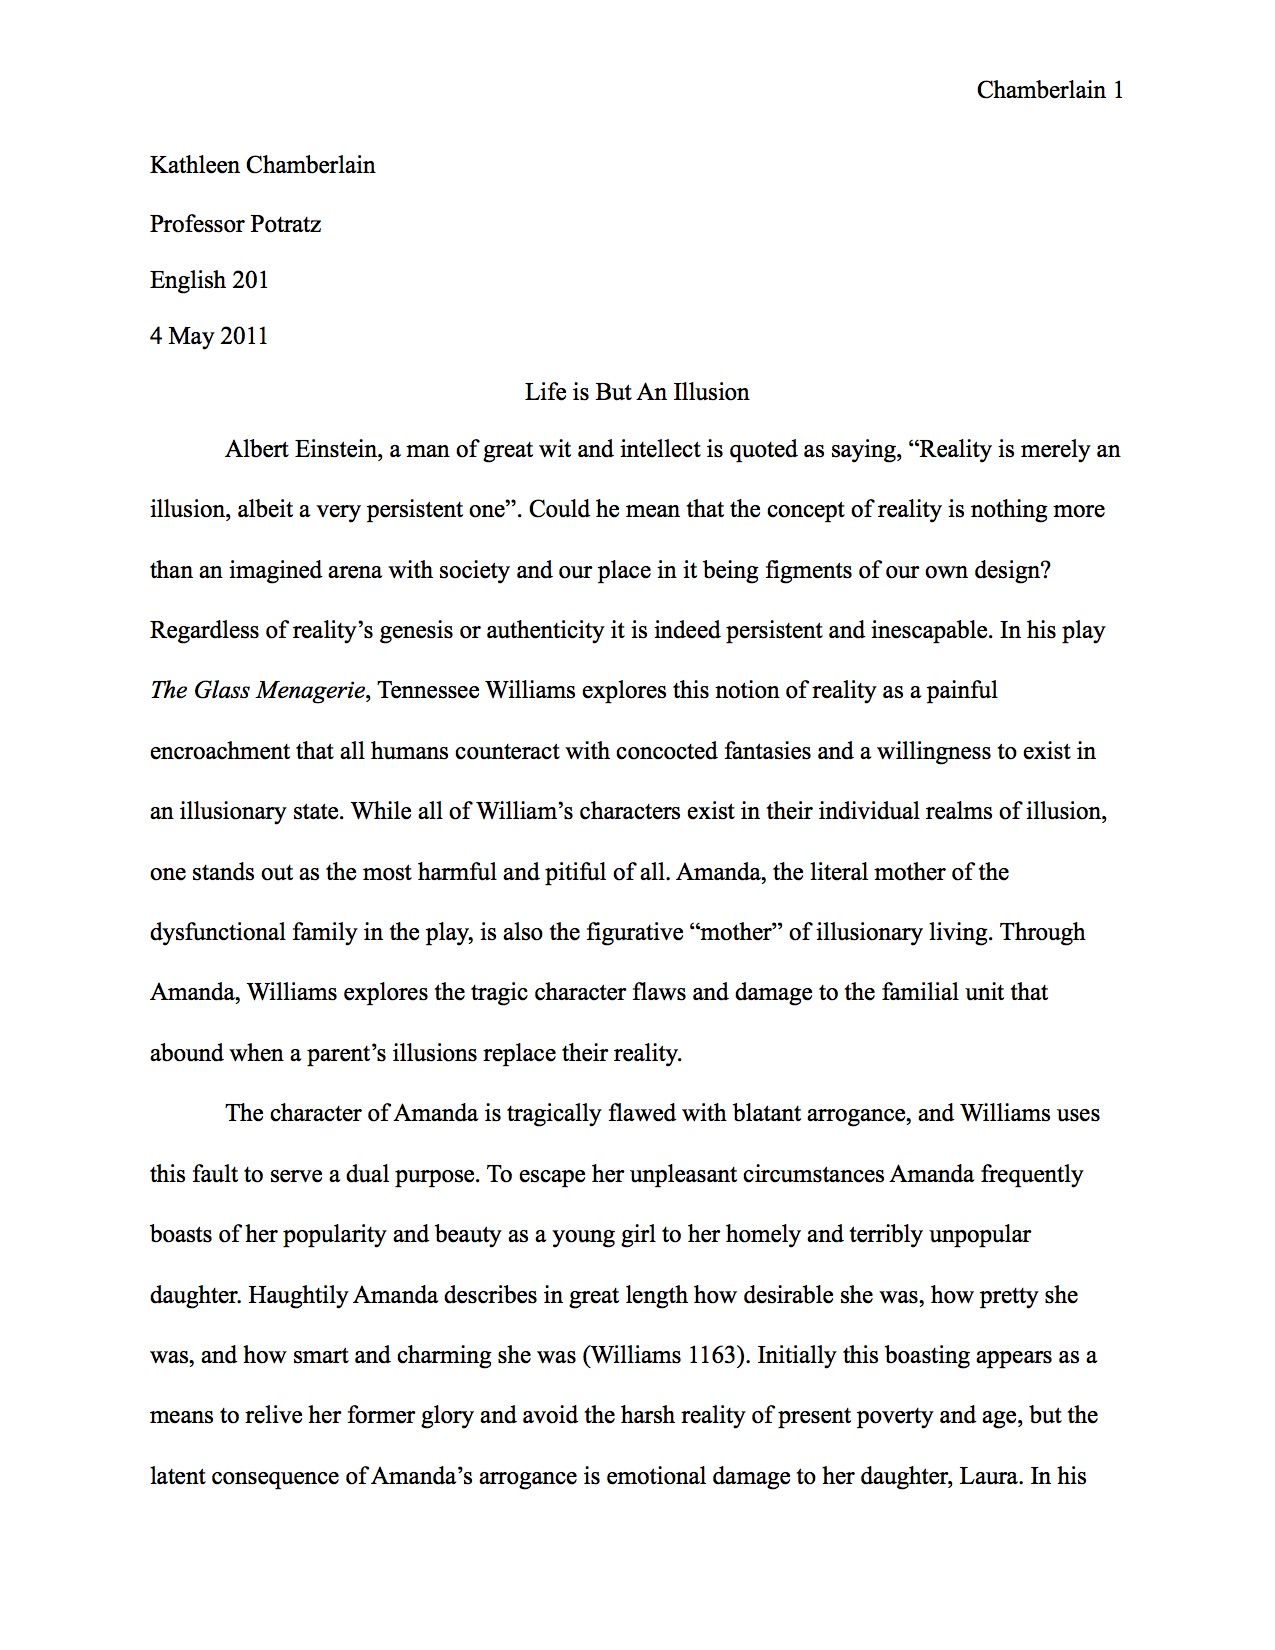 drama writing examples